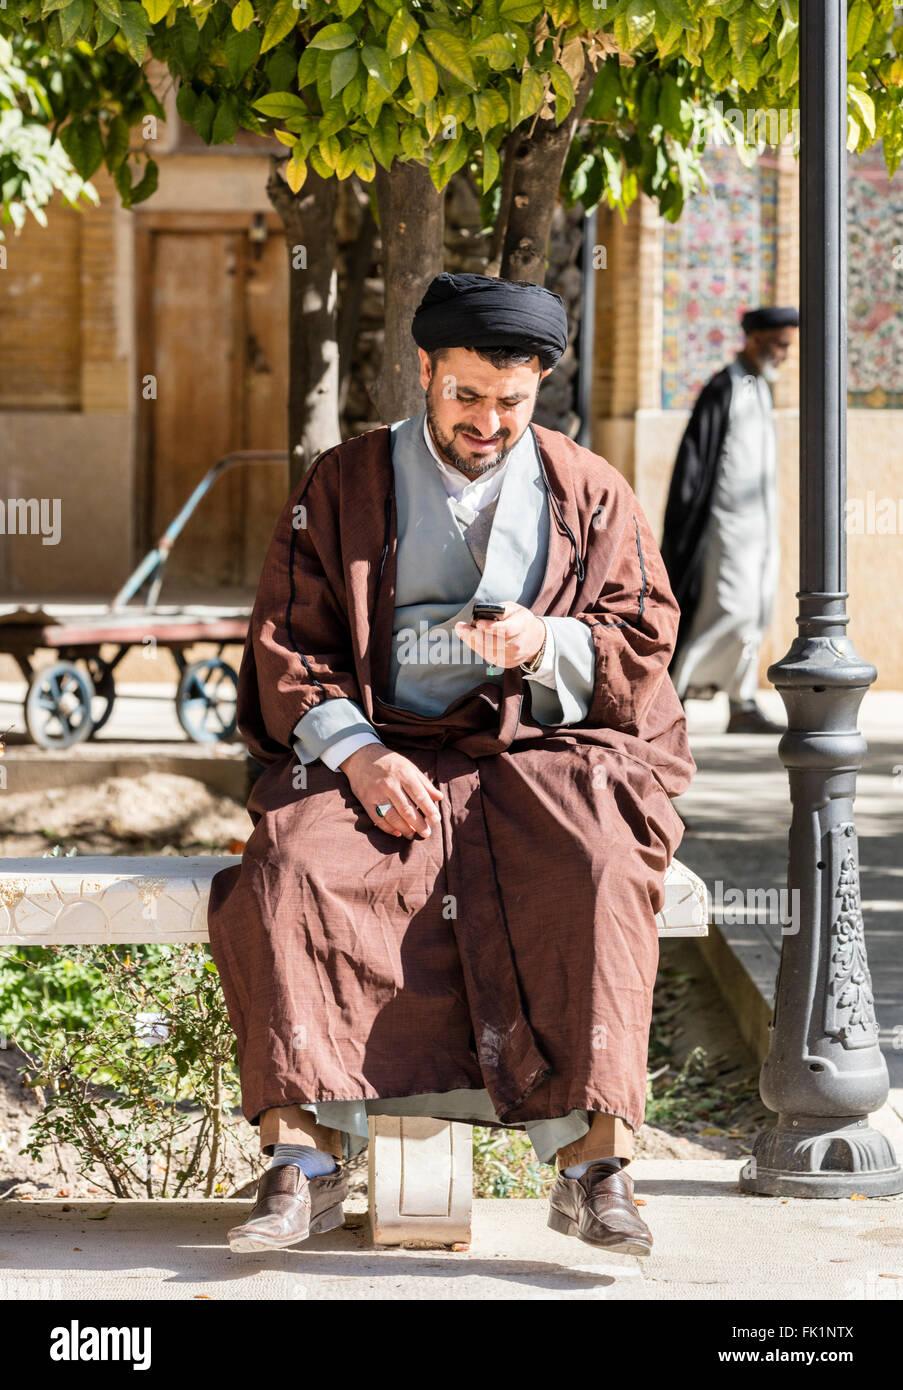 Mullah checks his mobile phone while sitting on a bench at the Khan Madrassa, Shiraz, Iran - Stock Image